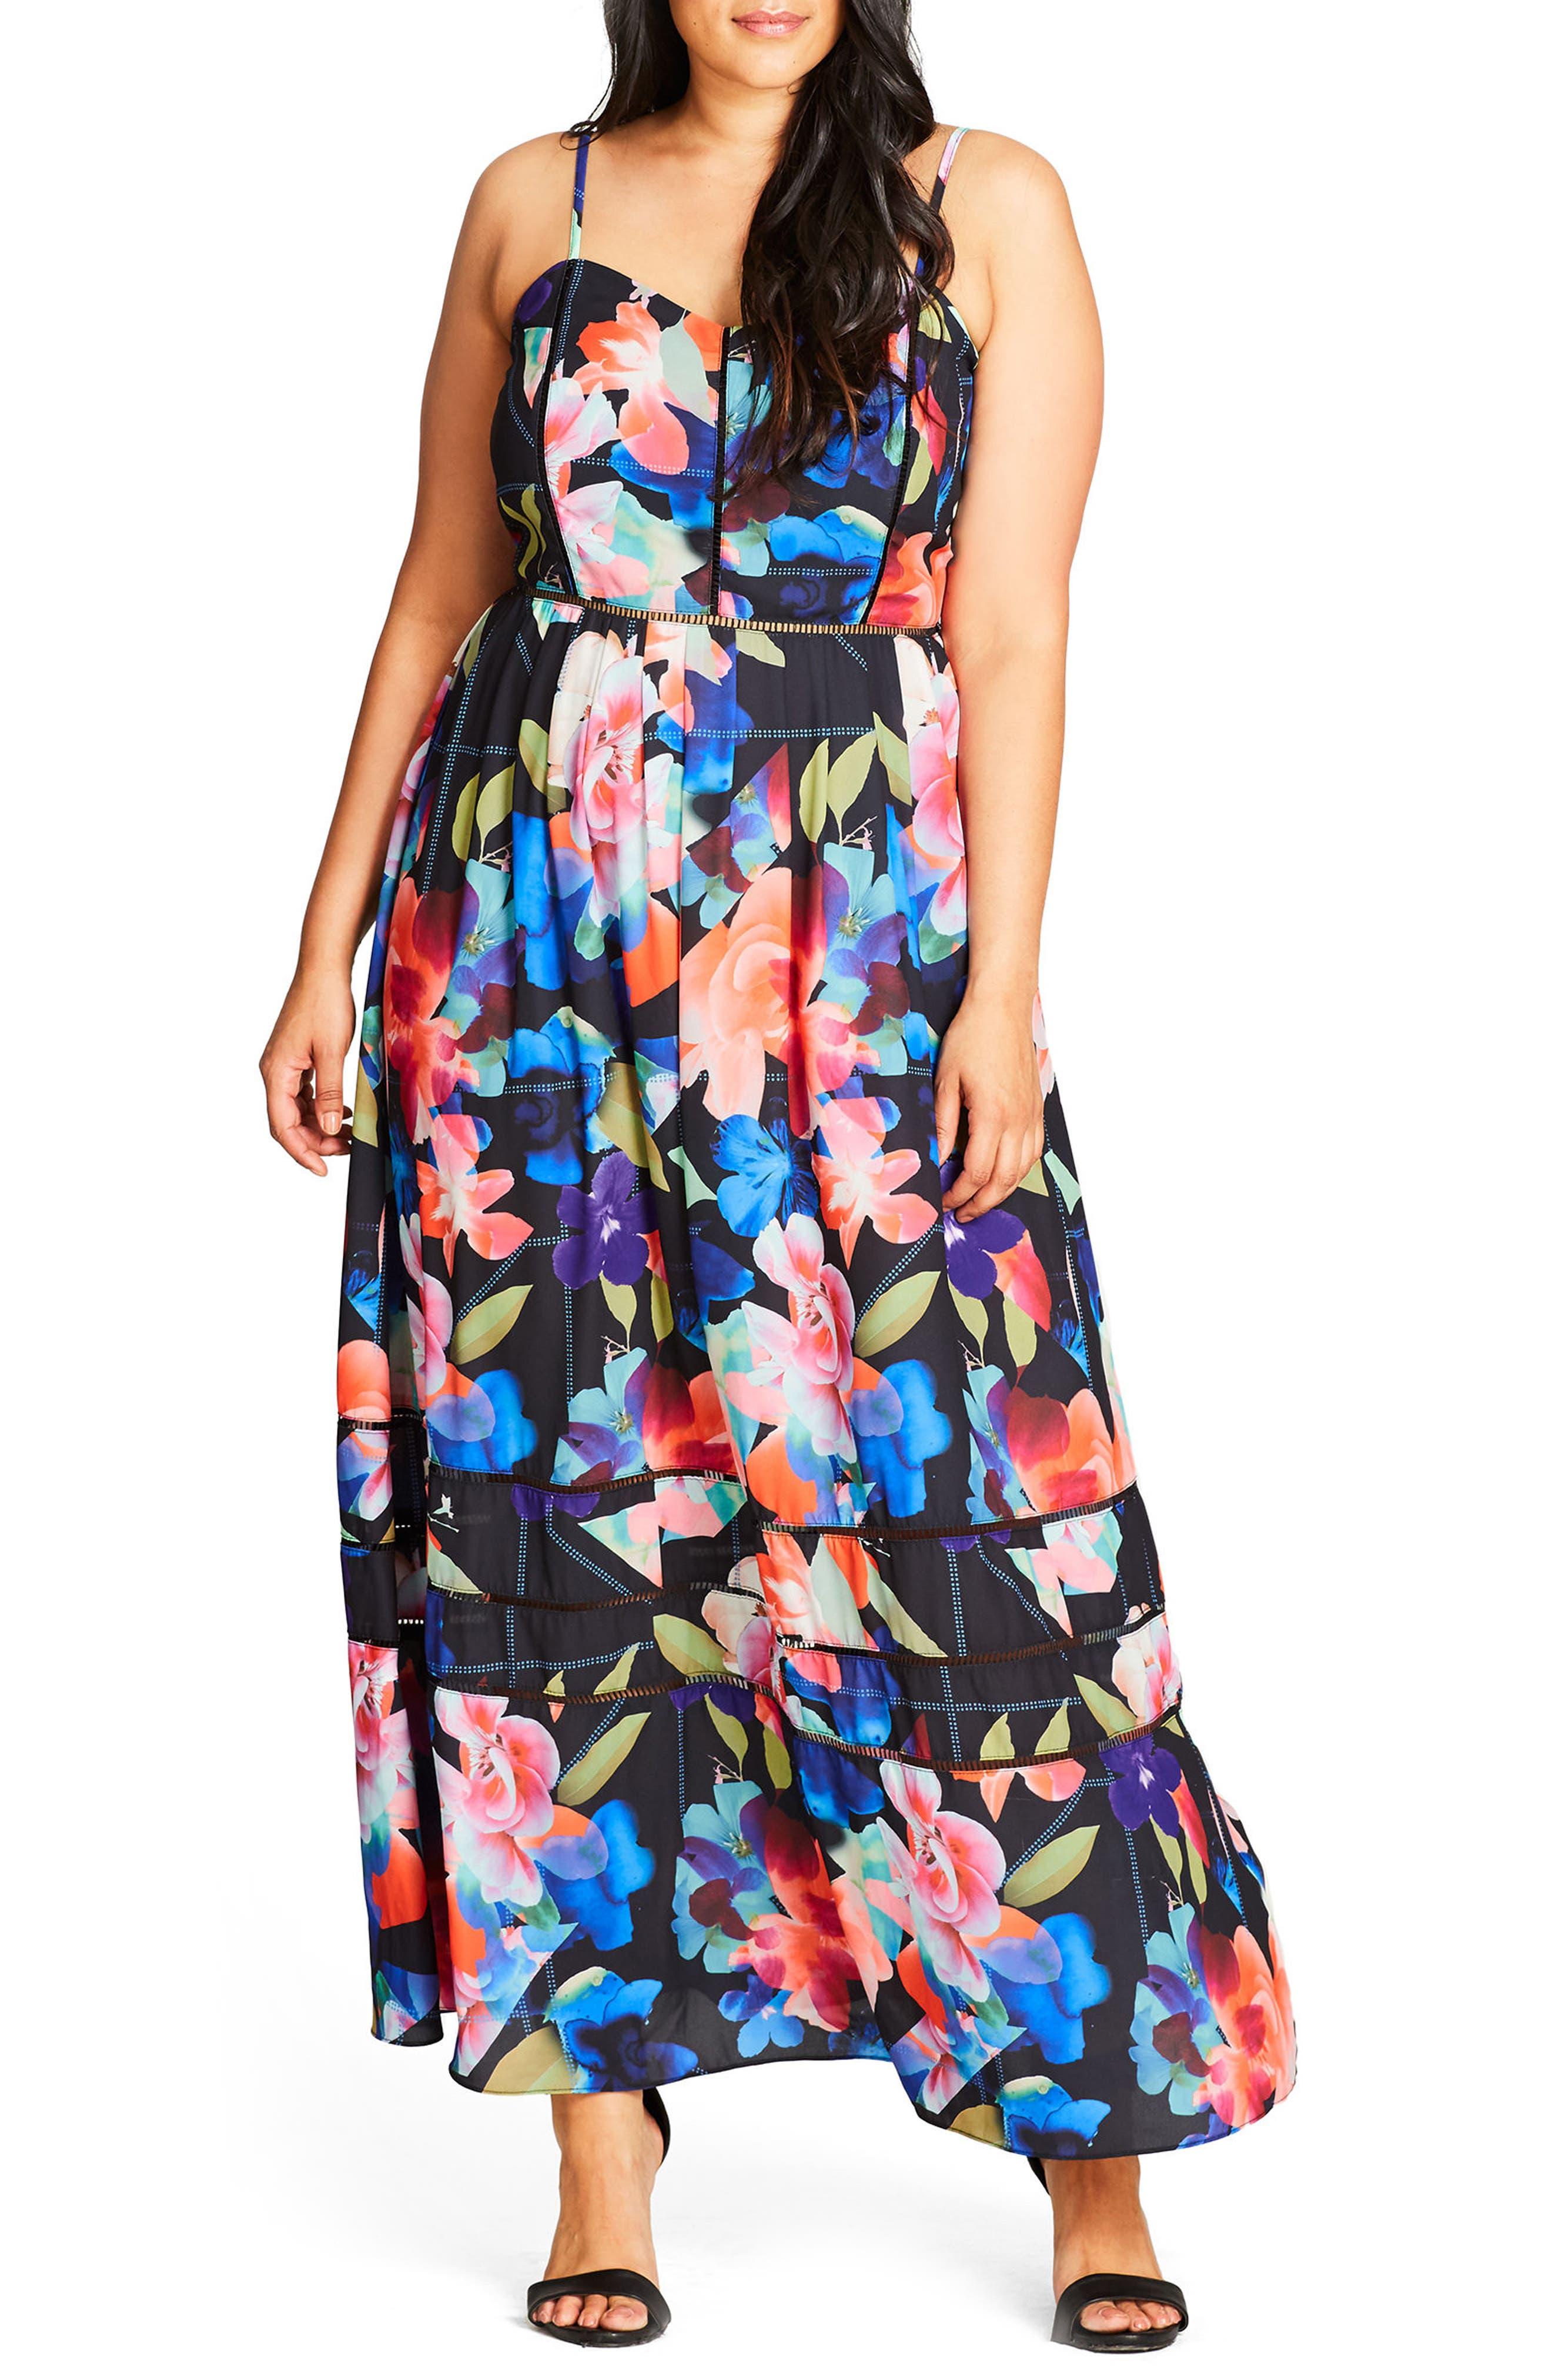 Alternate Image 1 Selected - City Chic Maxi Dress (Plus Size)